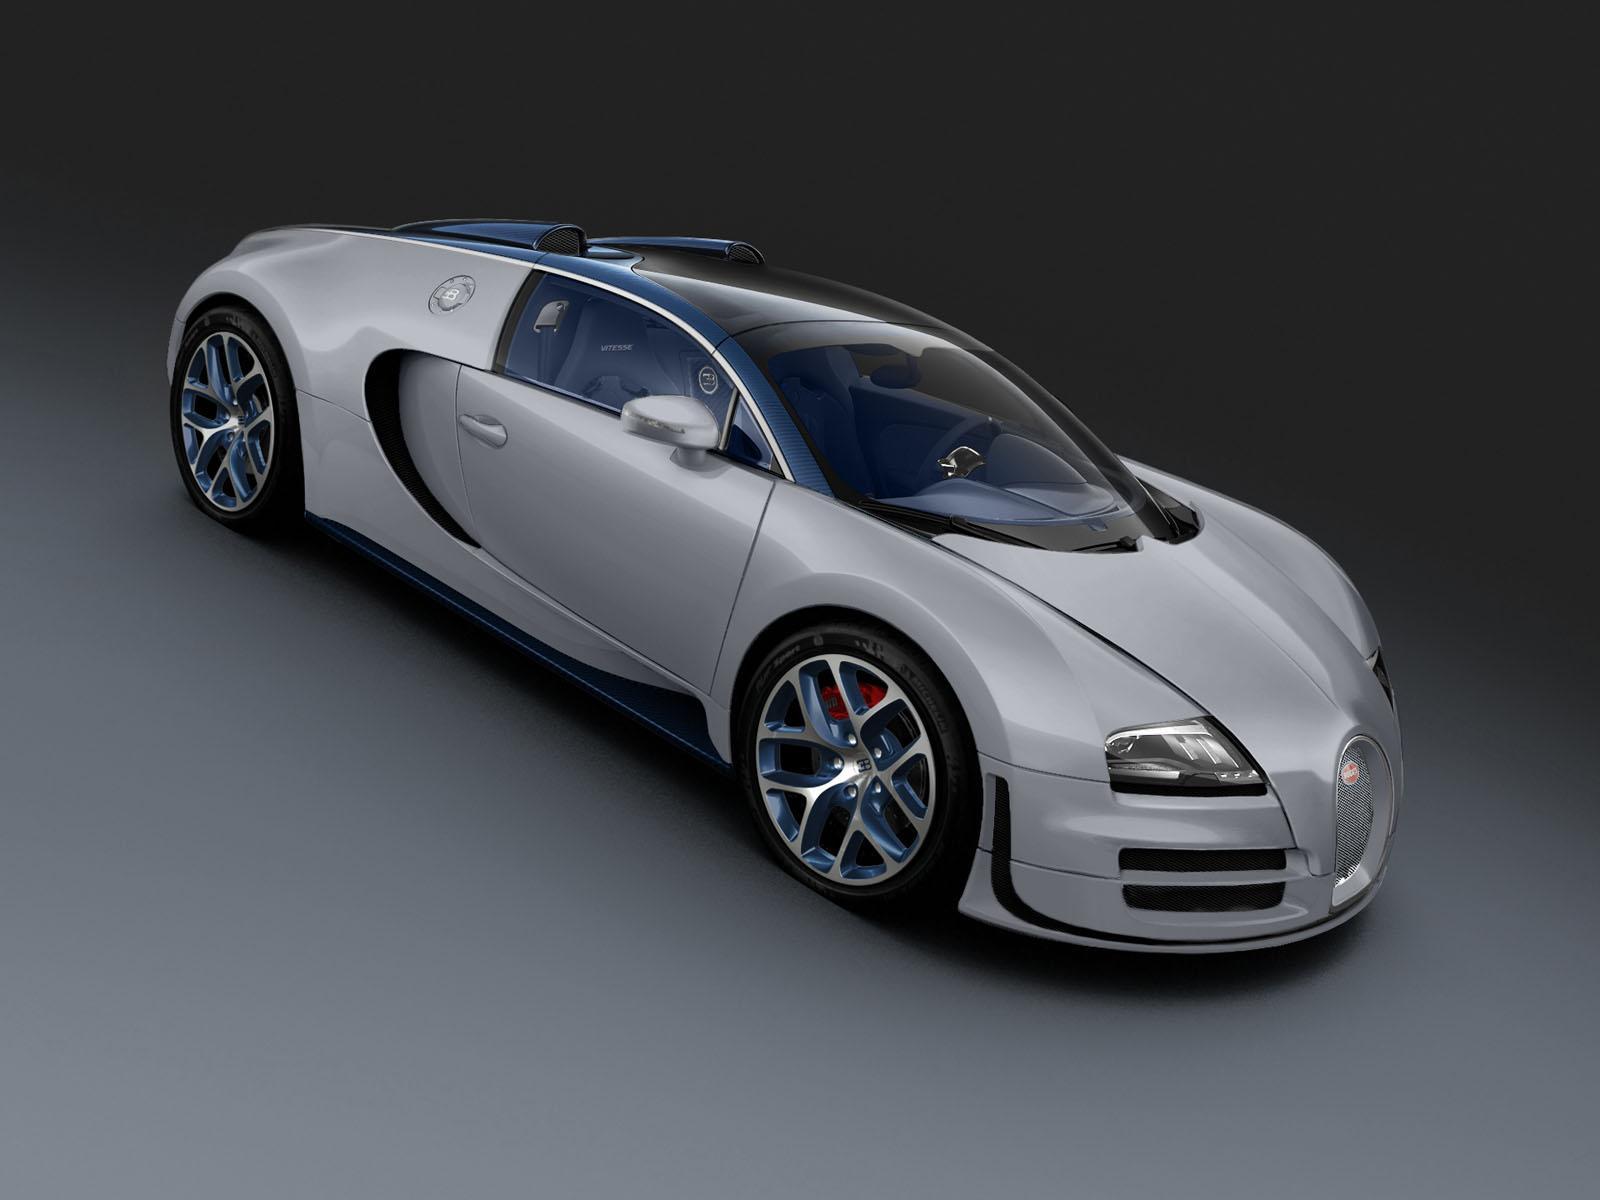 Bugatti Veyron 16.4 Grand Sport Vitesse Rafale Edition Desktop Background